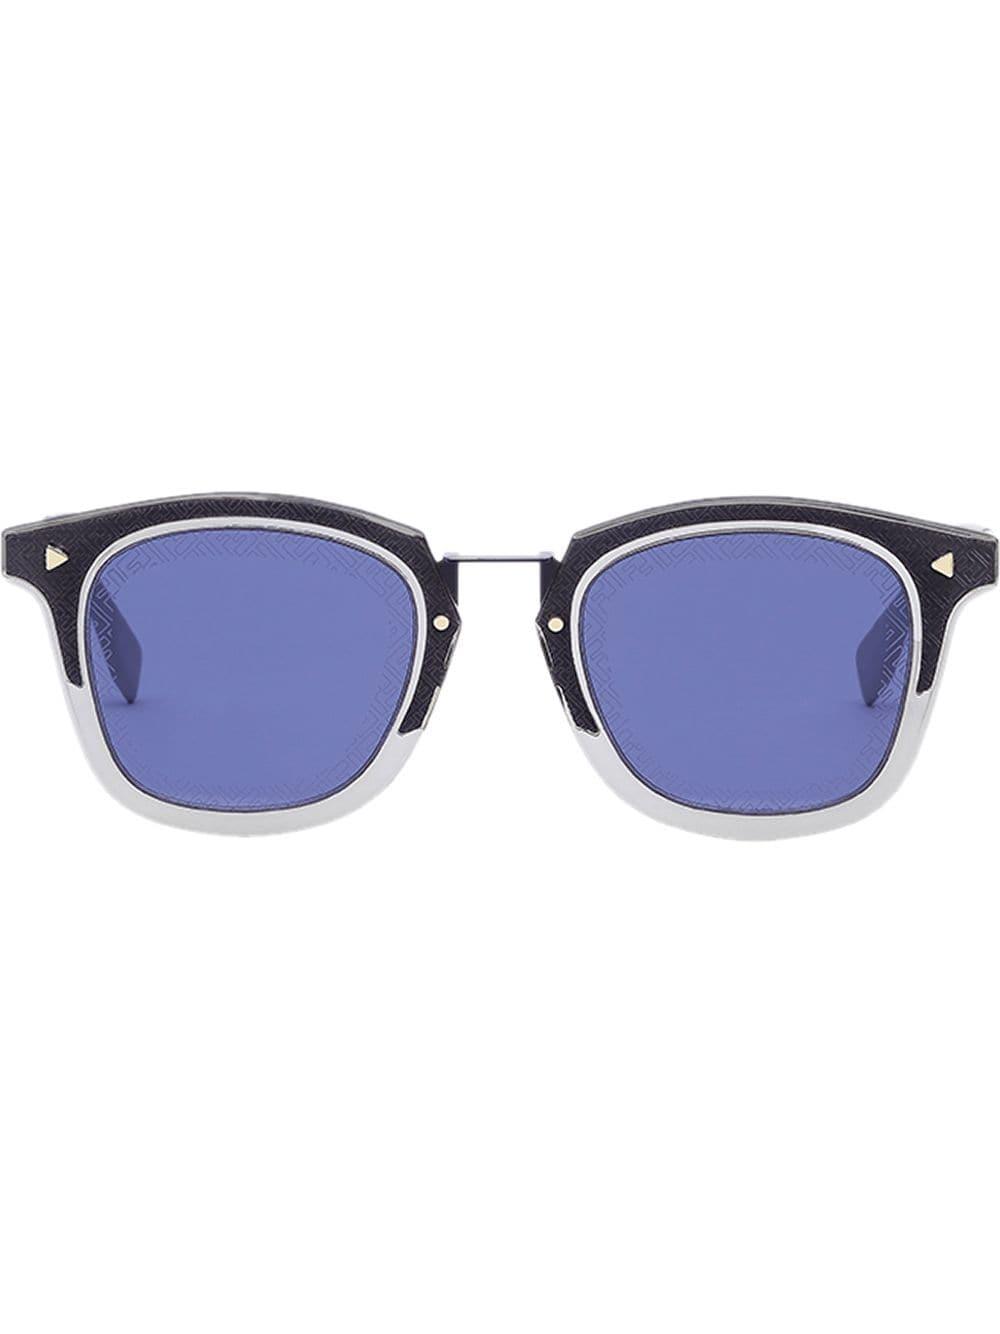 75c5f0b34 Fendi Eyewear FF square frame sunglasses - Gold in 2019 | Products ...